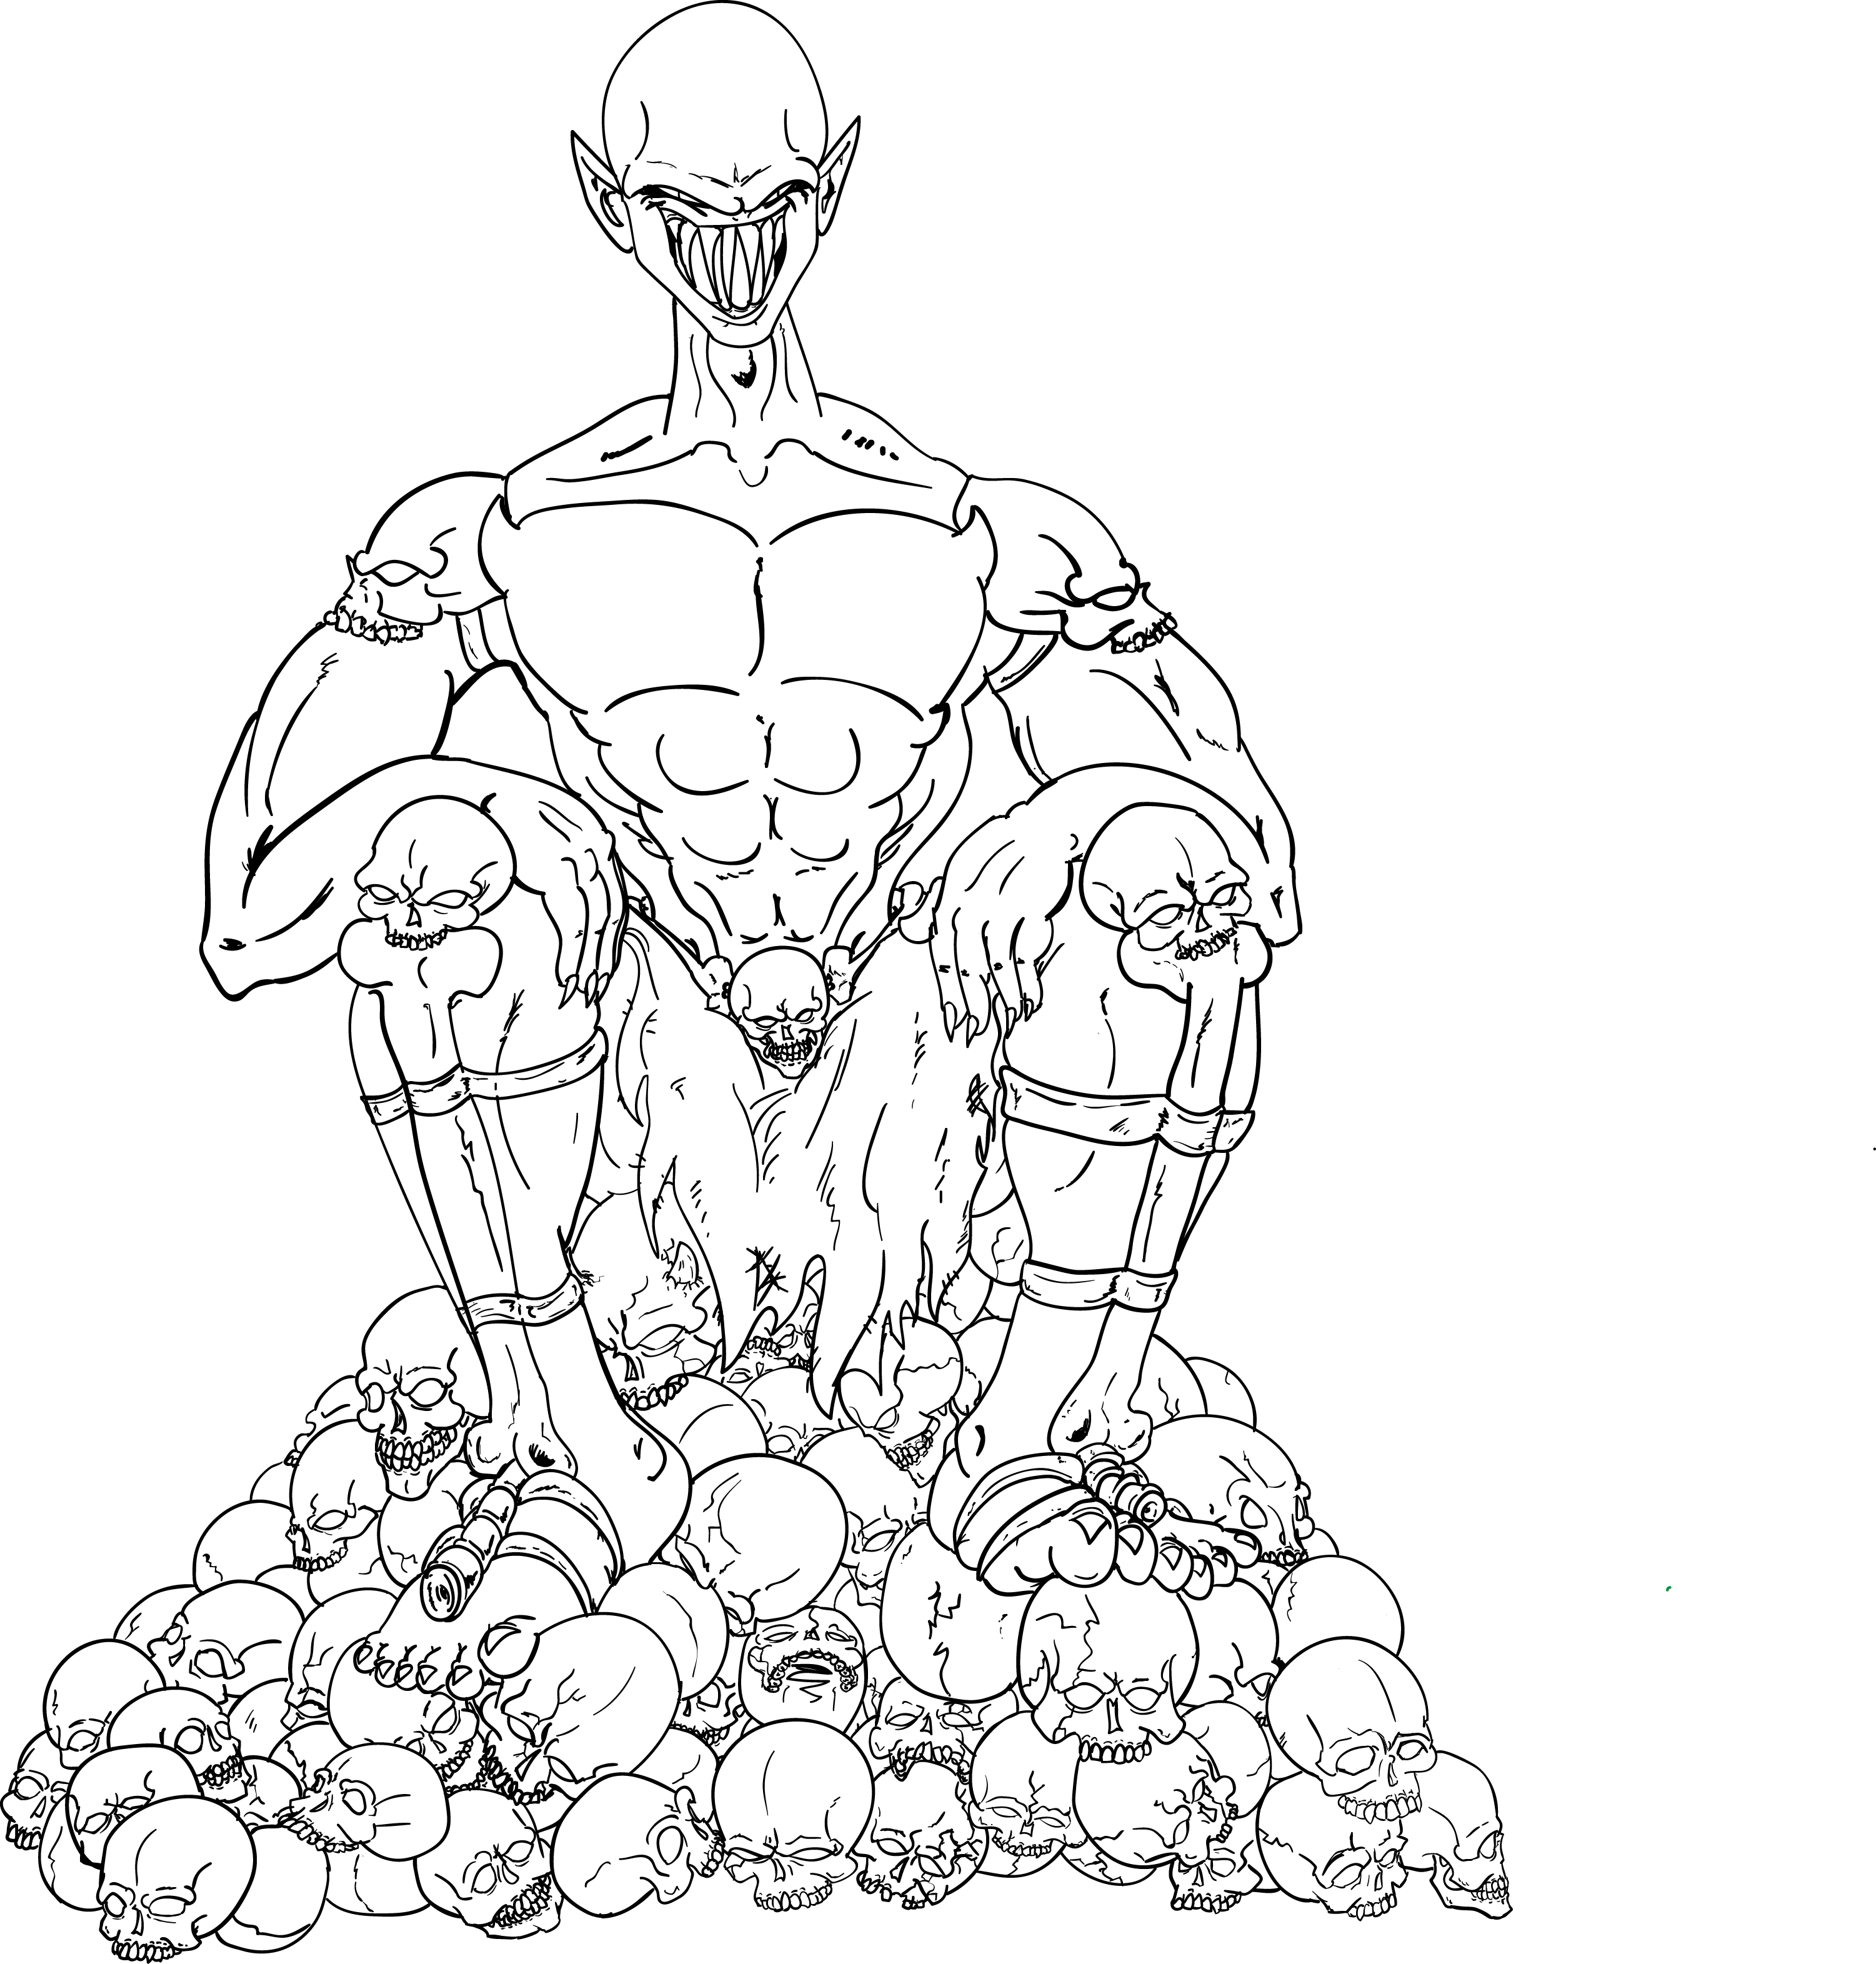 The Bone Lord (linework)